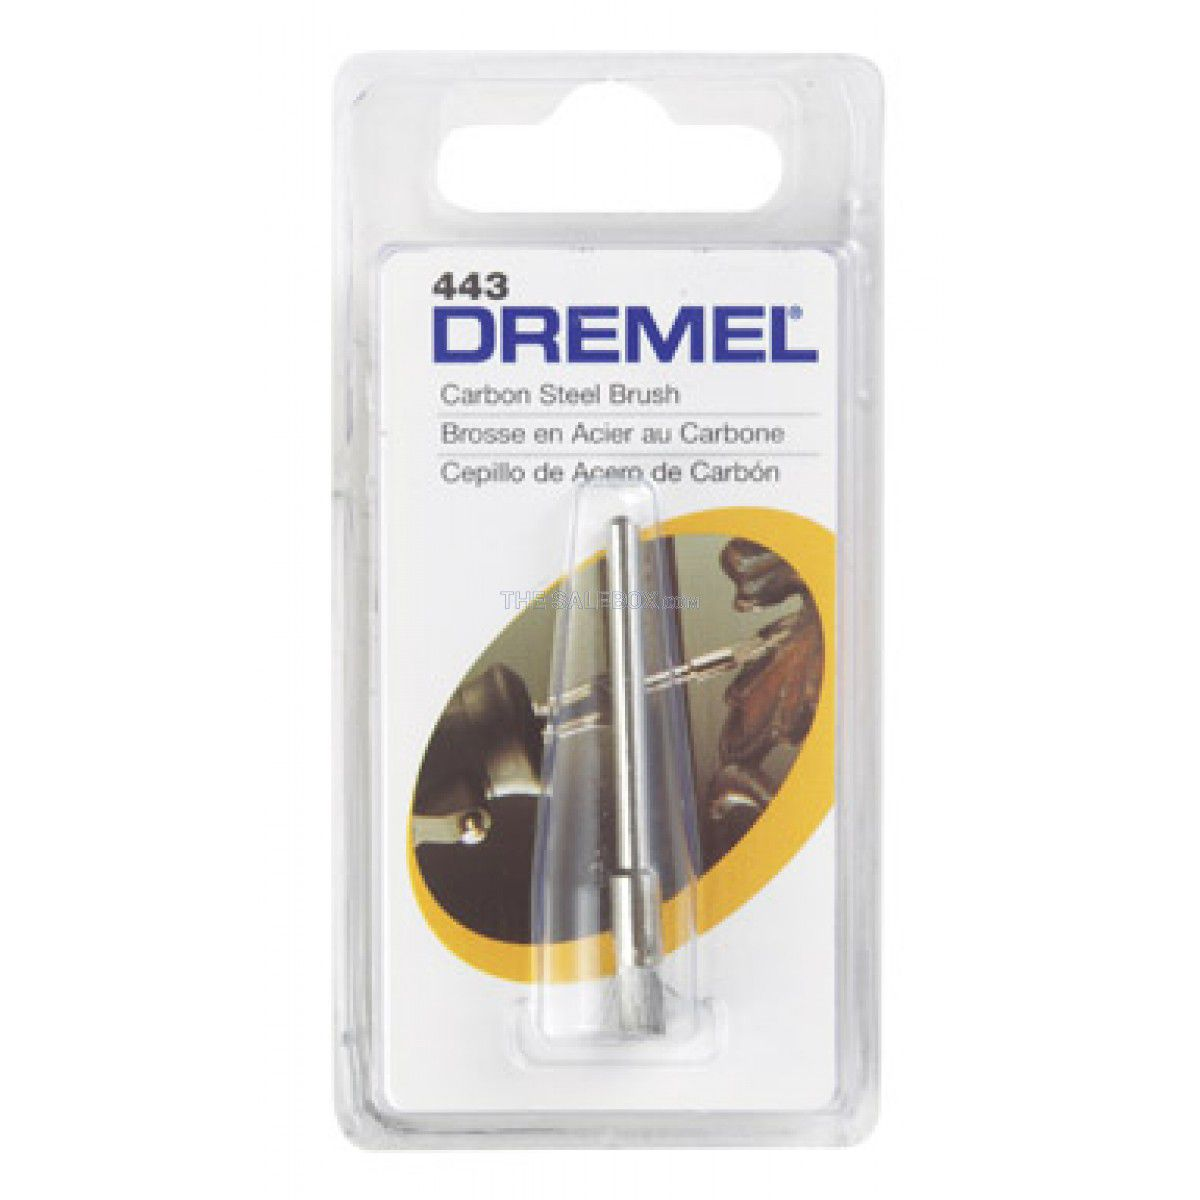 Escova de Aço tipo Pincel 1/8'' 443 - DREMEL